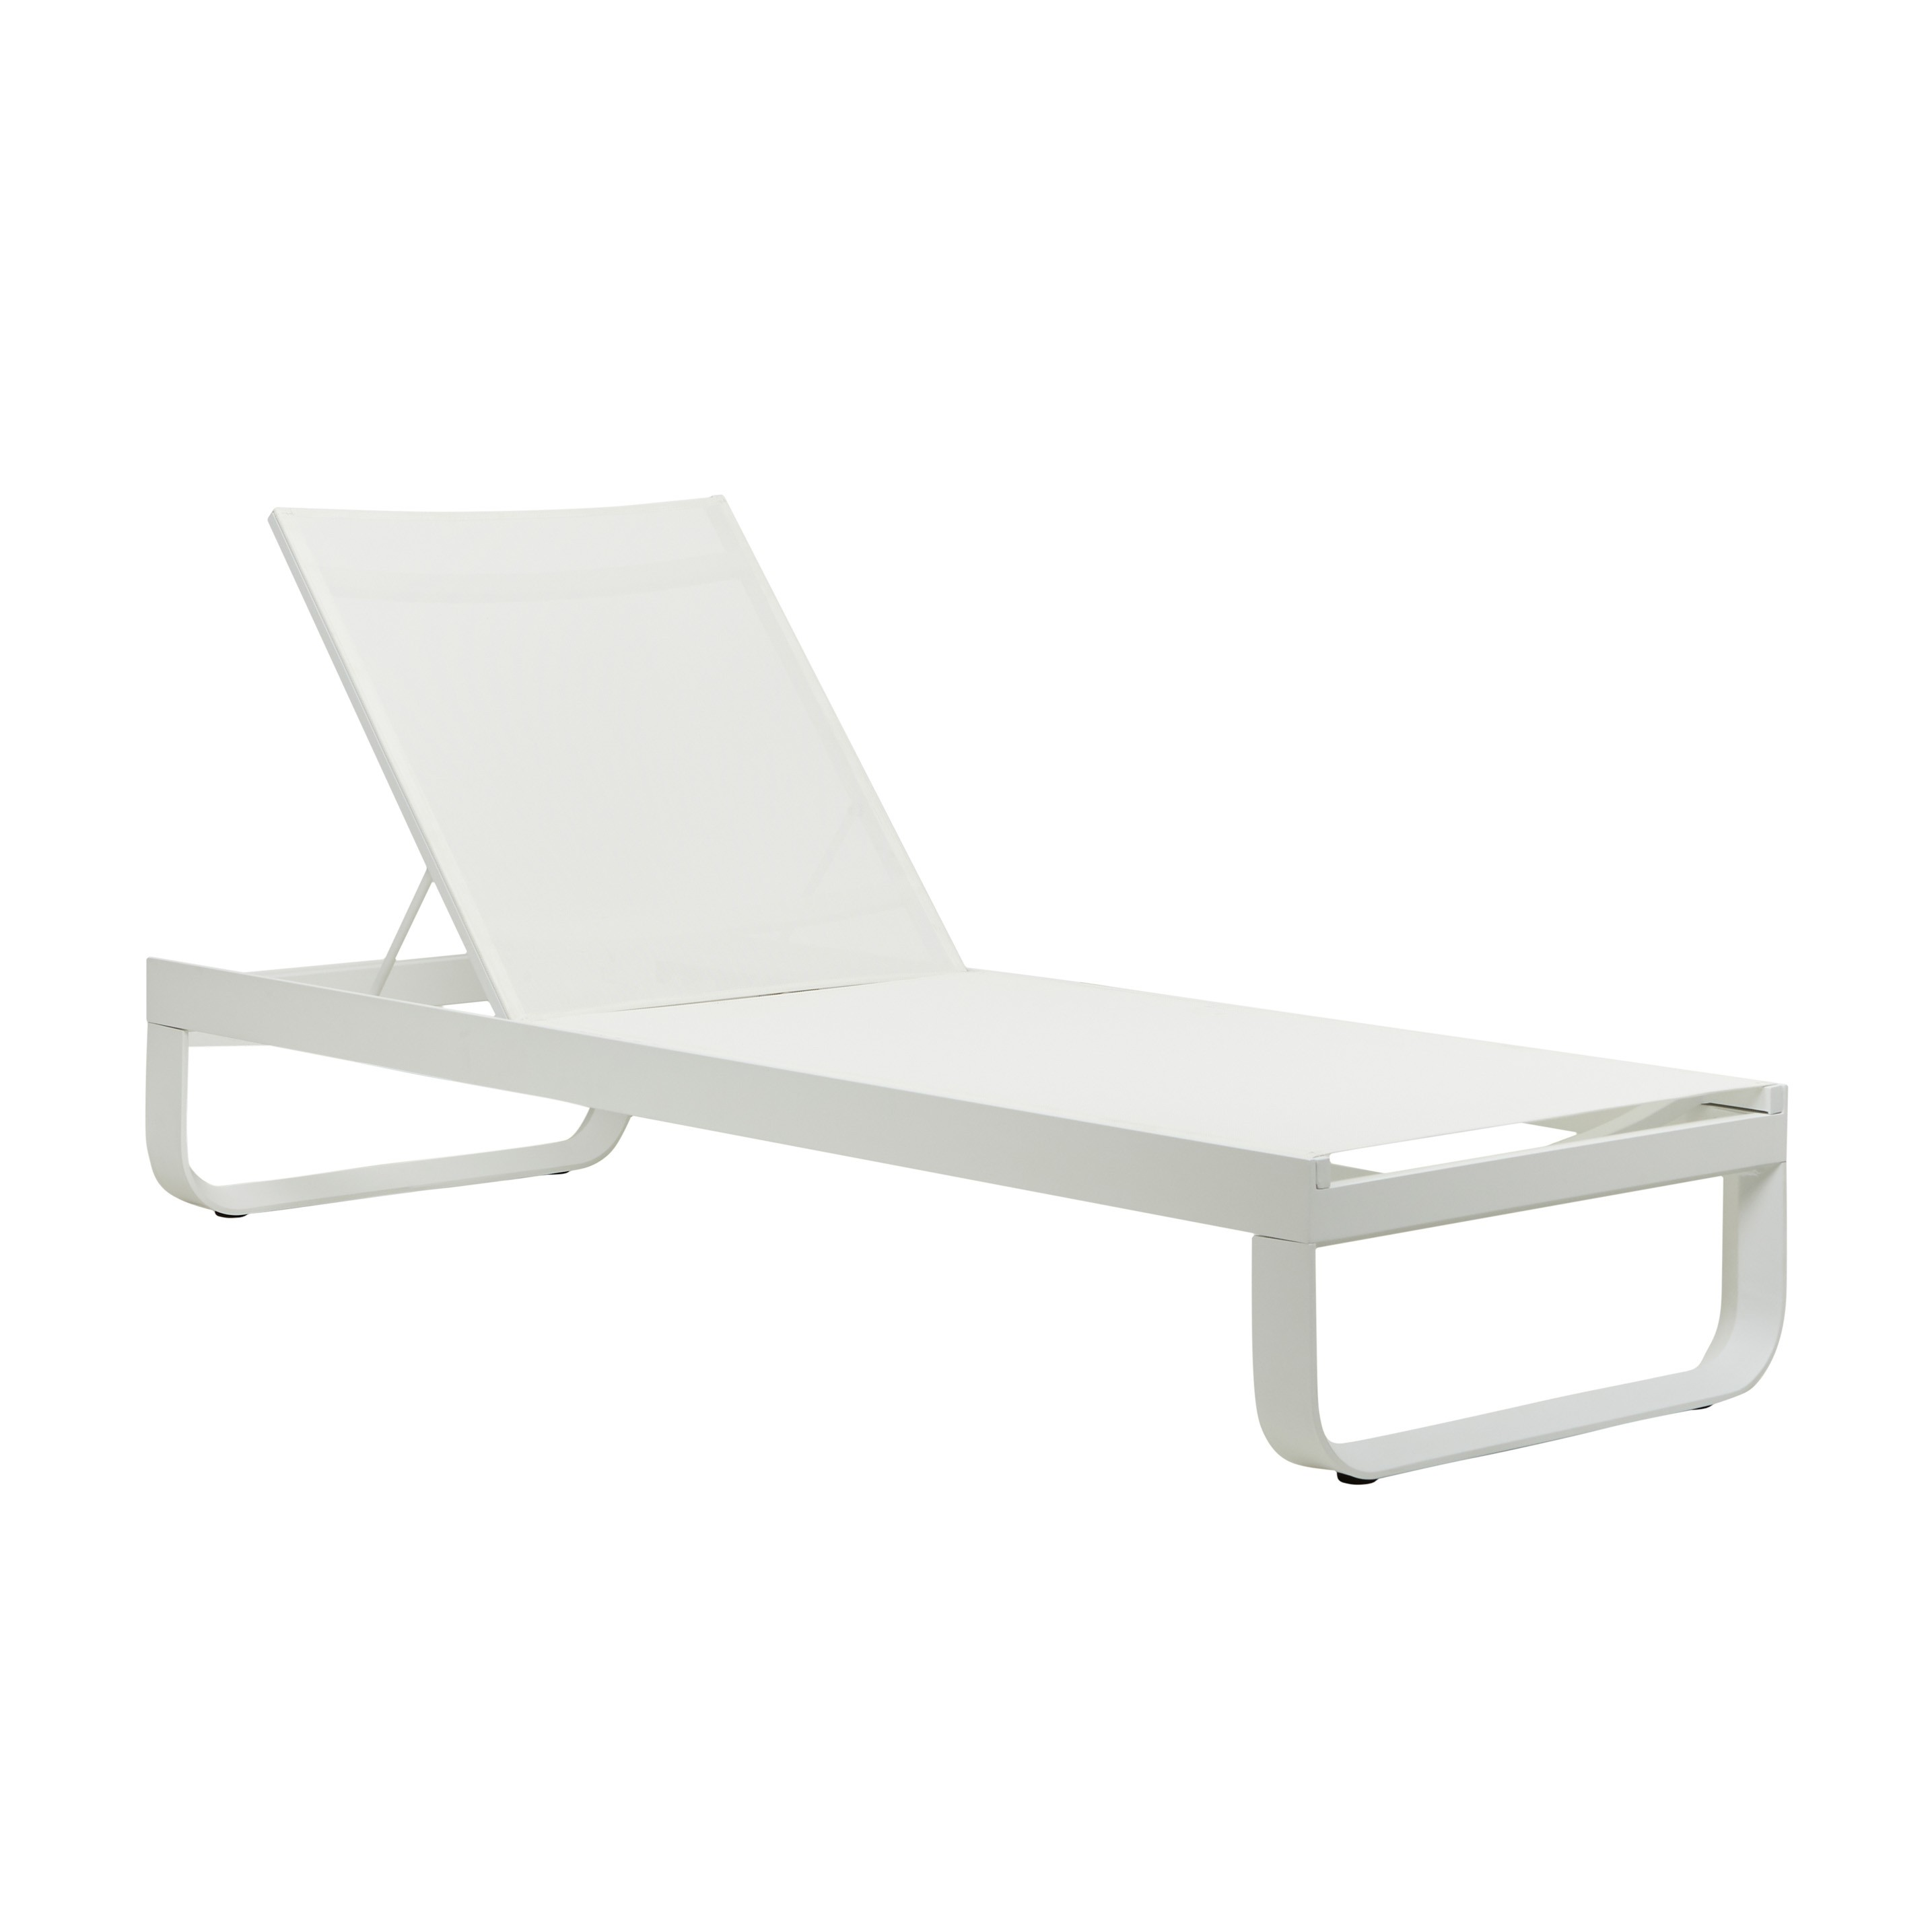 Furniture Hero-Images Sunbeds-and-Daybeds pier-curve-sunbed-01